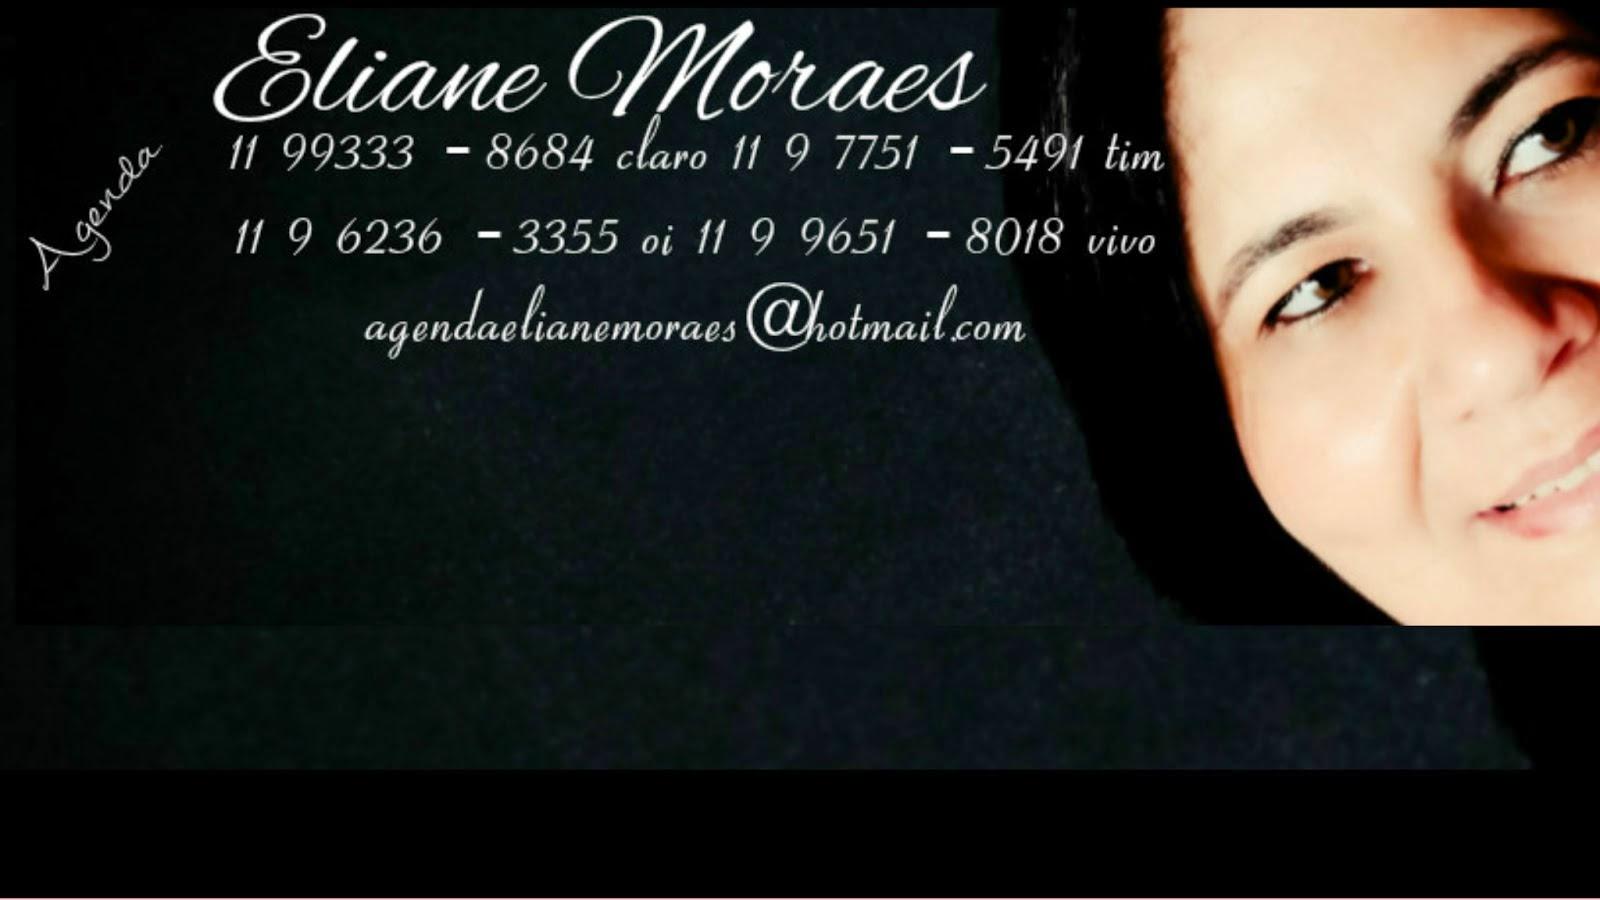 Eliane Moraes Oficial